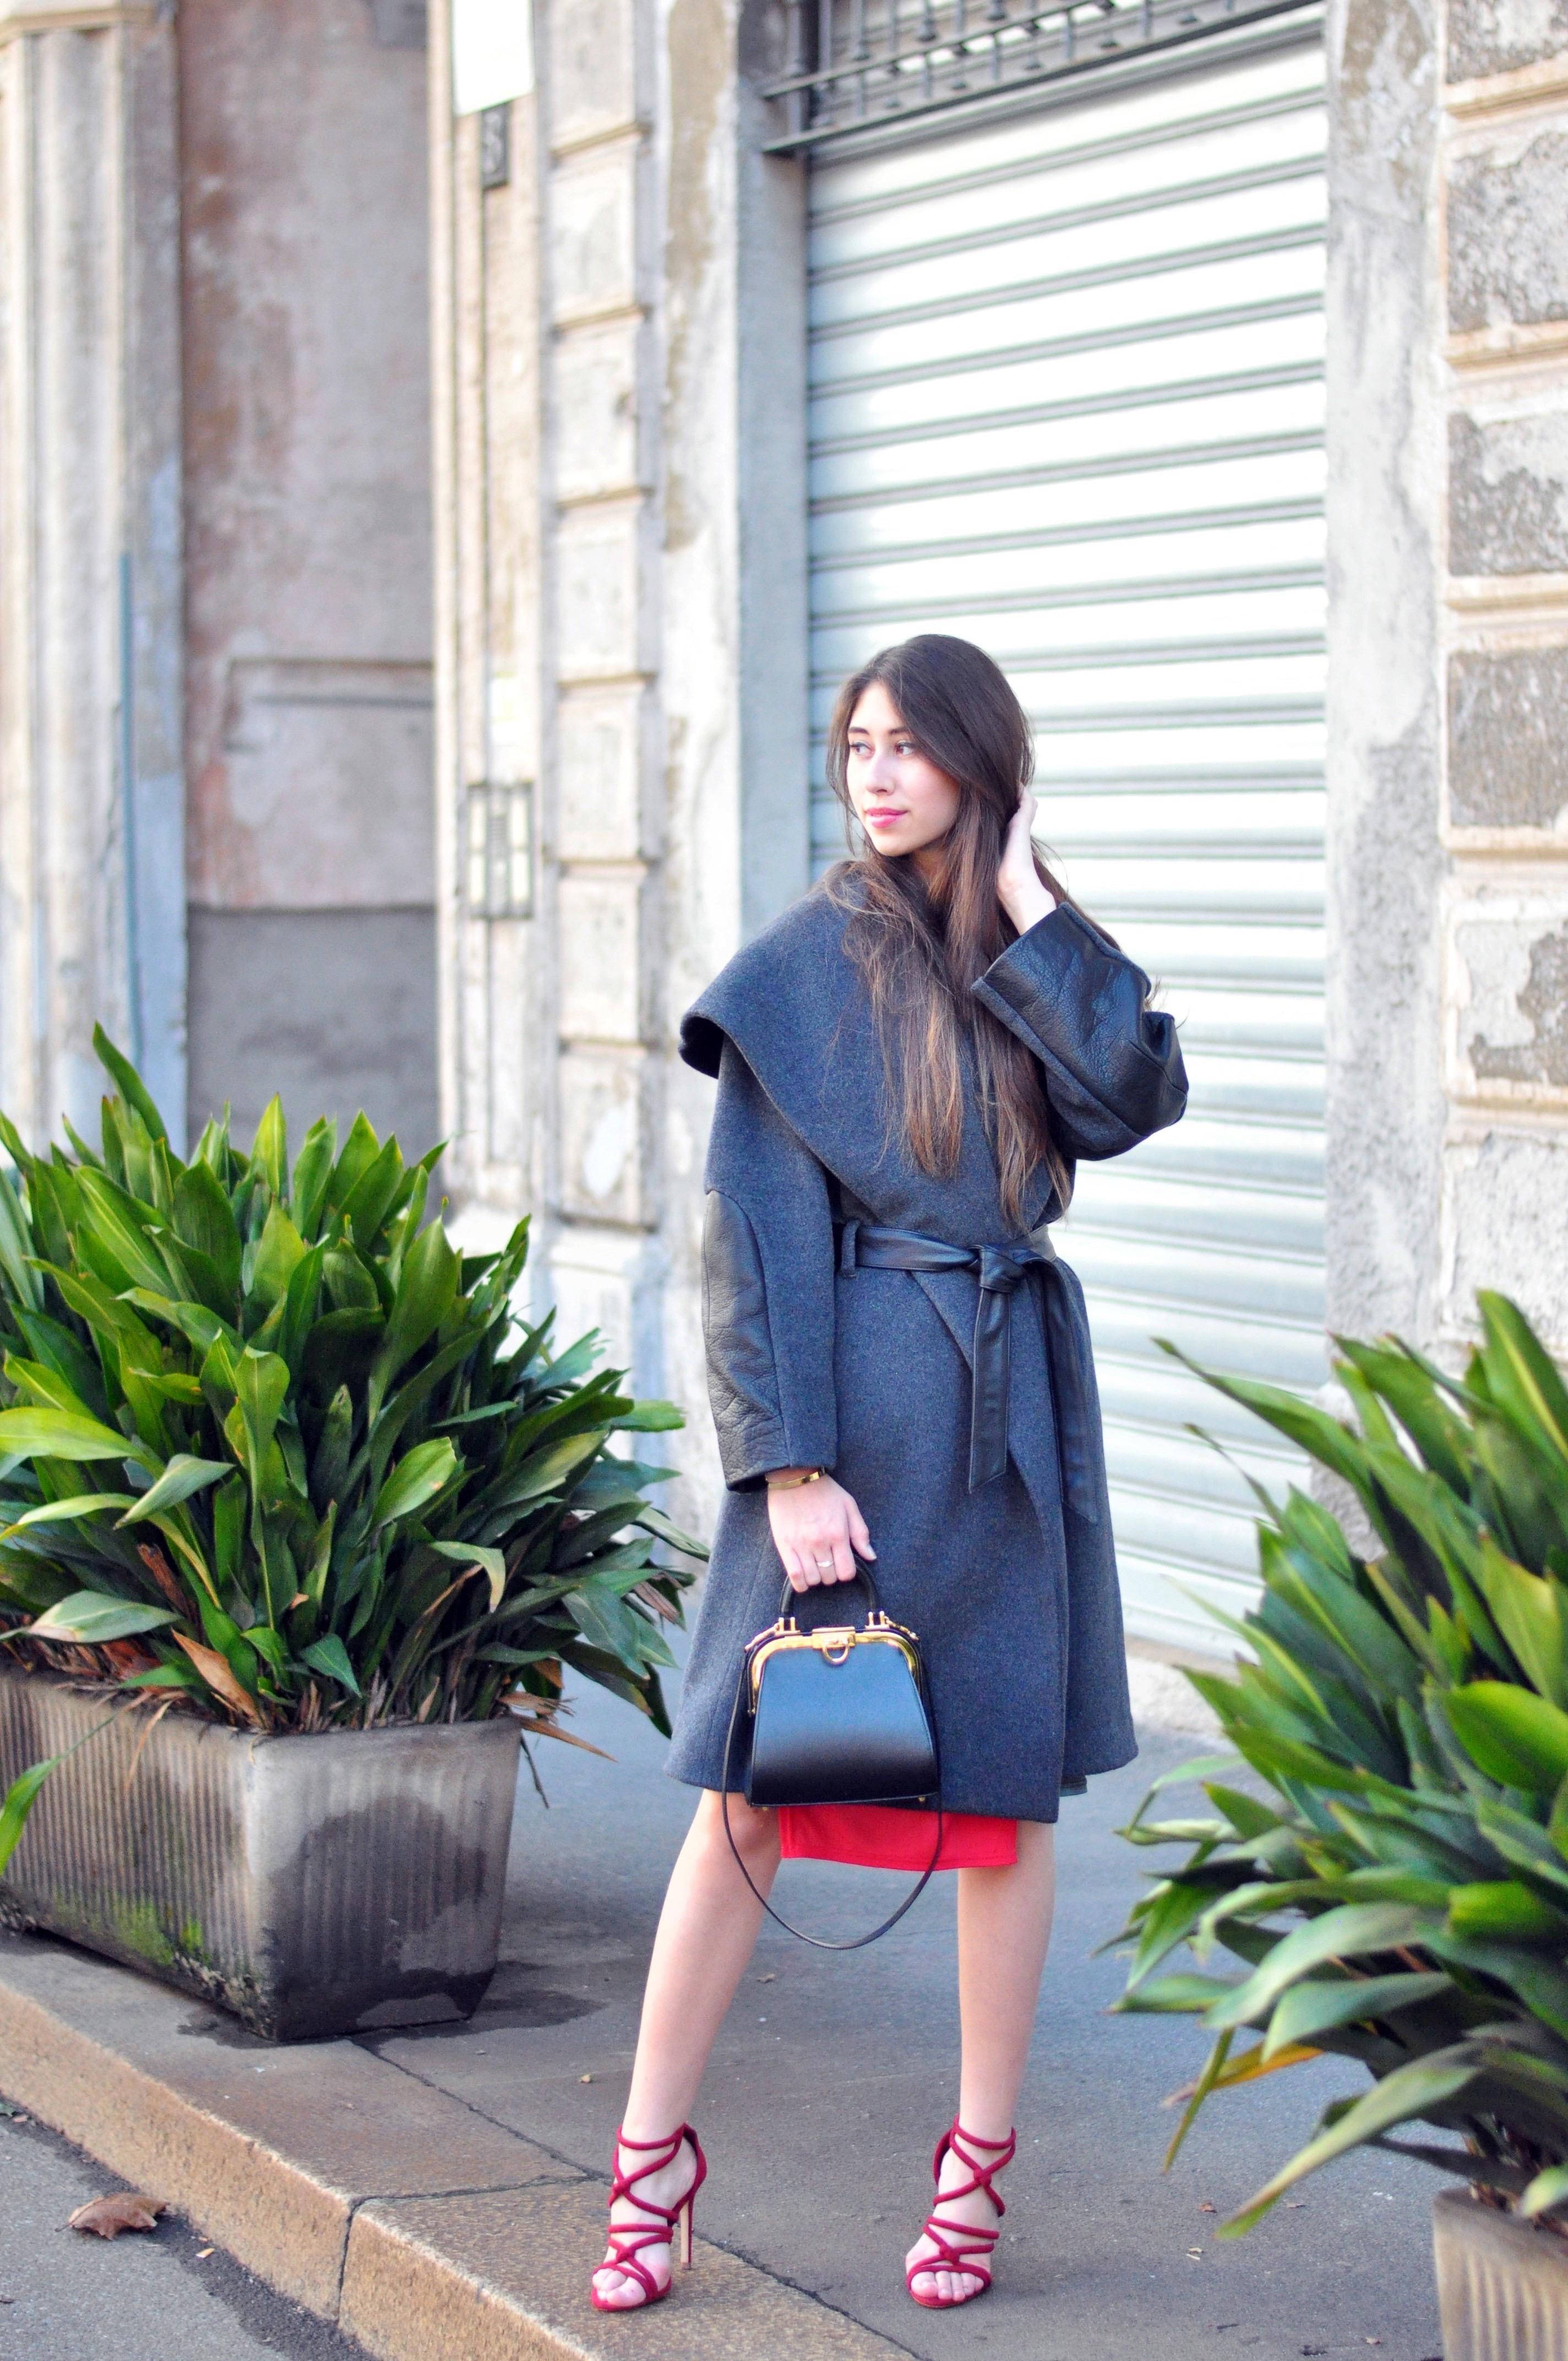 Milan Fashion Week SS16 streetstyle Luca Michele